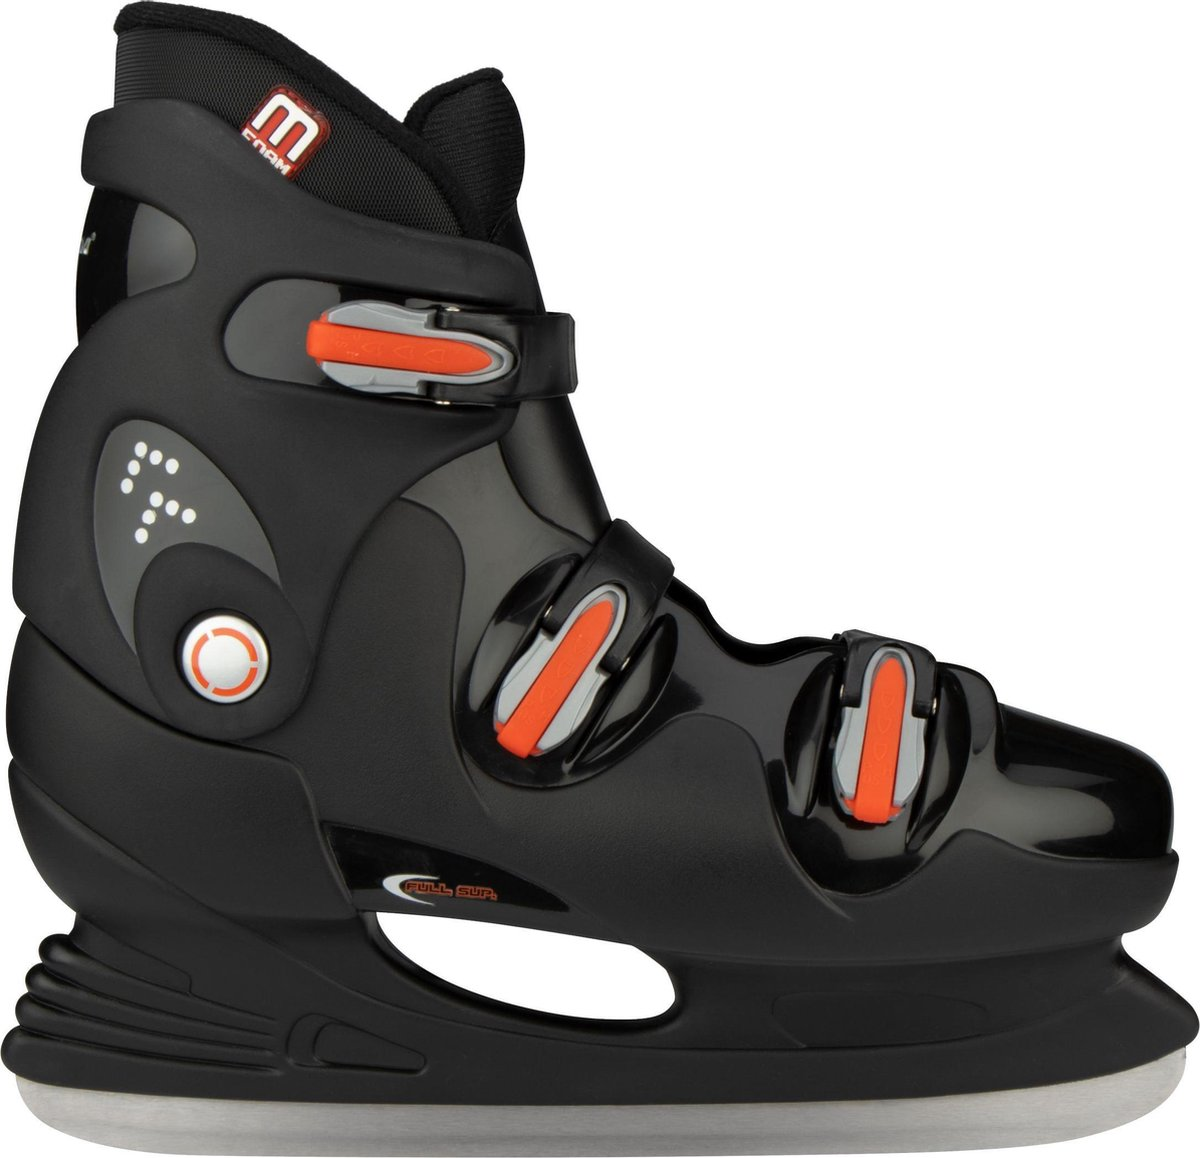 Nijdam IJshockeyschaats - Hardboot - Zwart/Zilver/Rood - 40